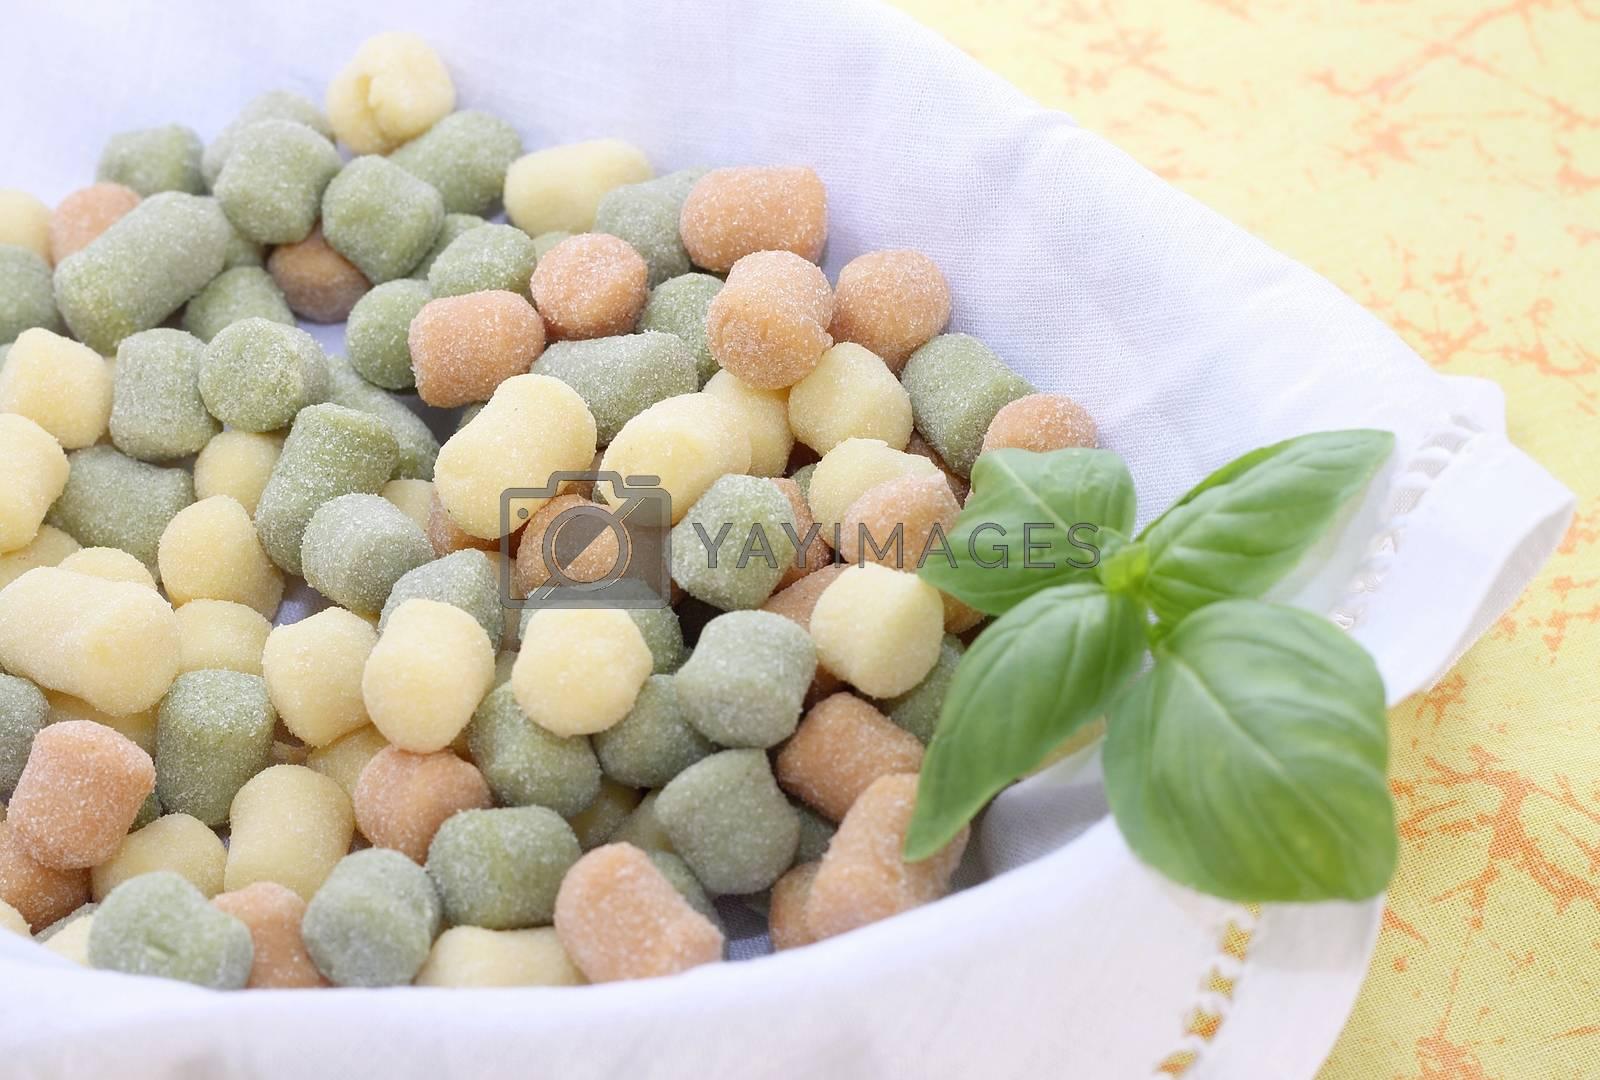 Italian gnocchi with basil leaves